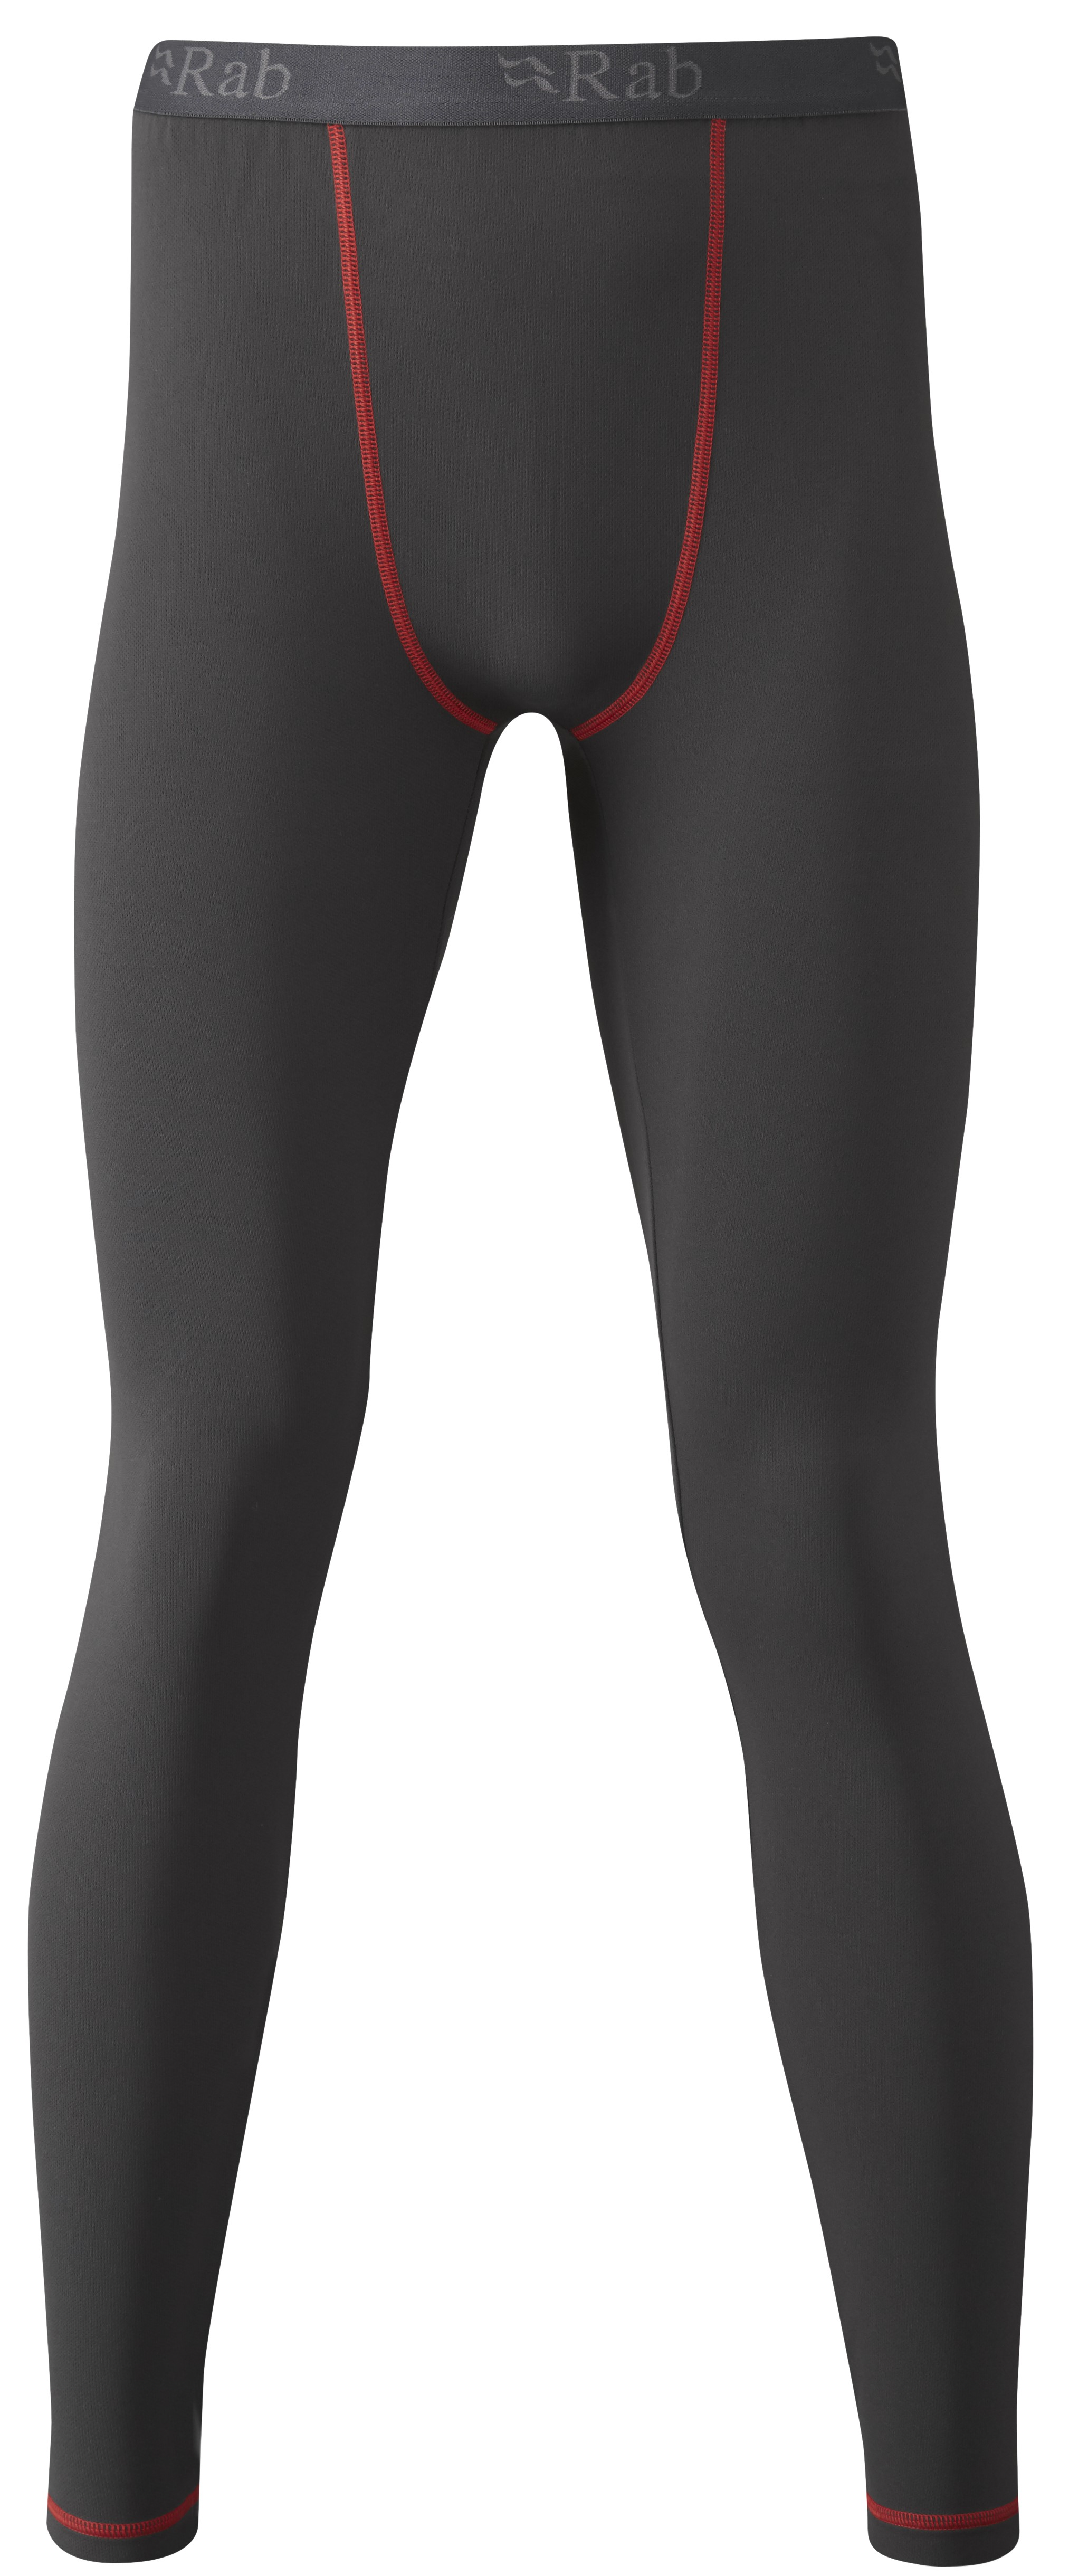 Rab DryFlo 120 Pants